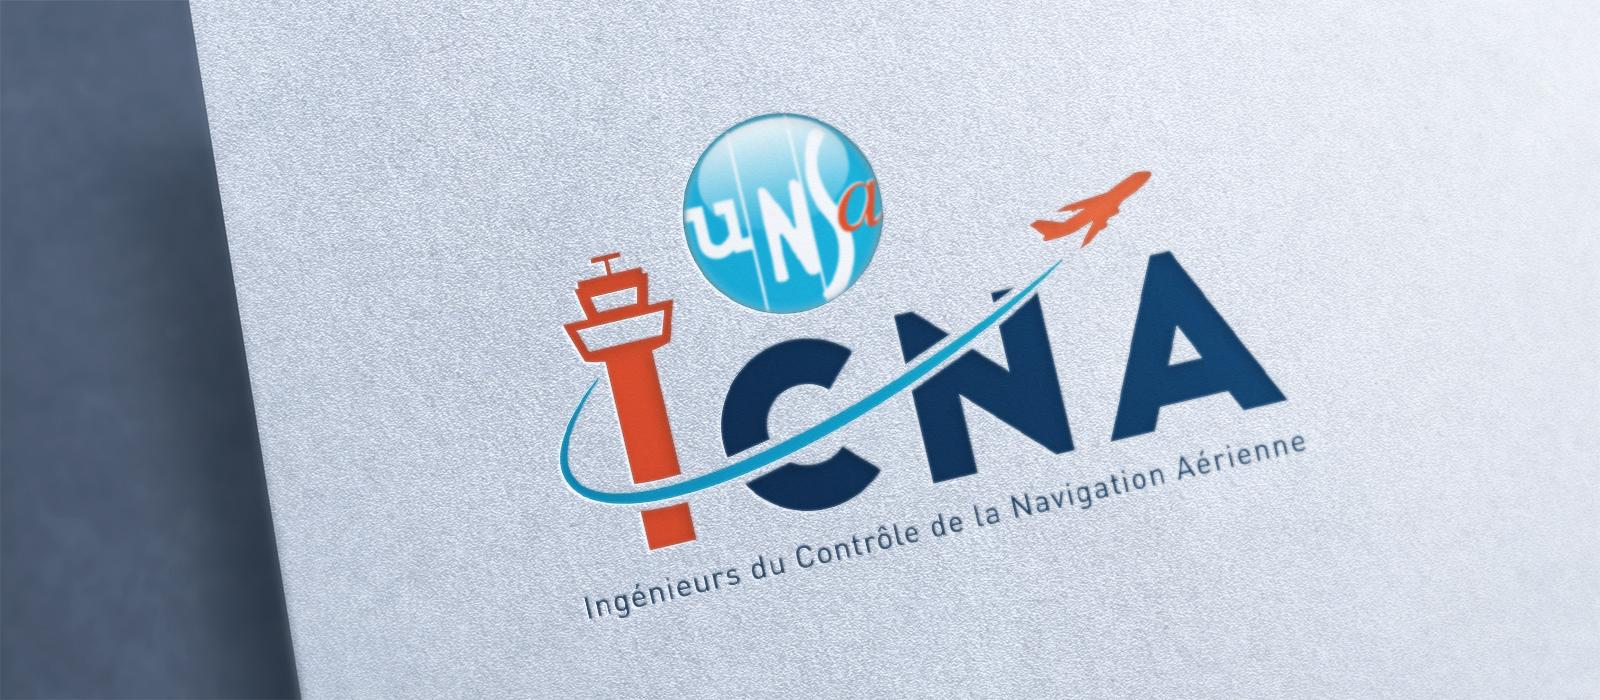 UNSA ICNA logotype